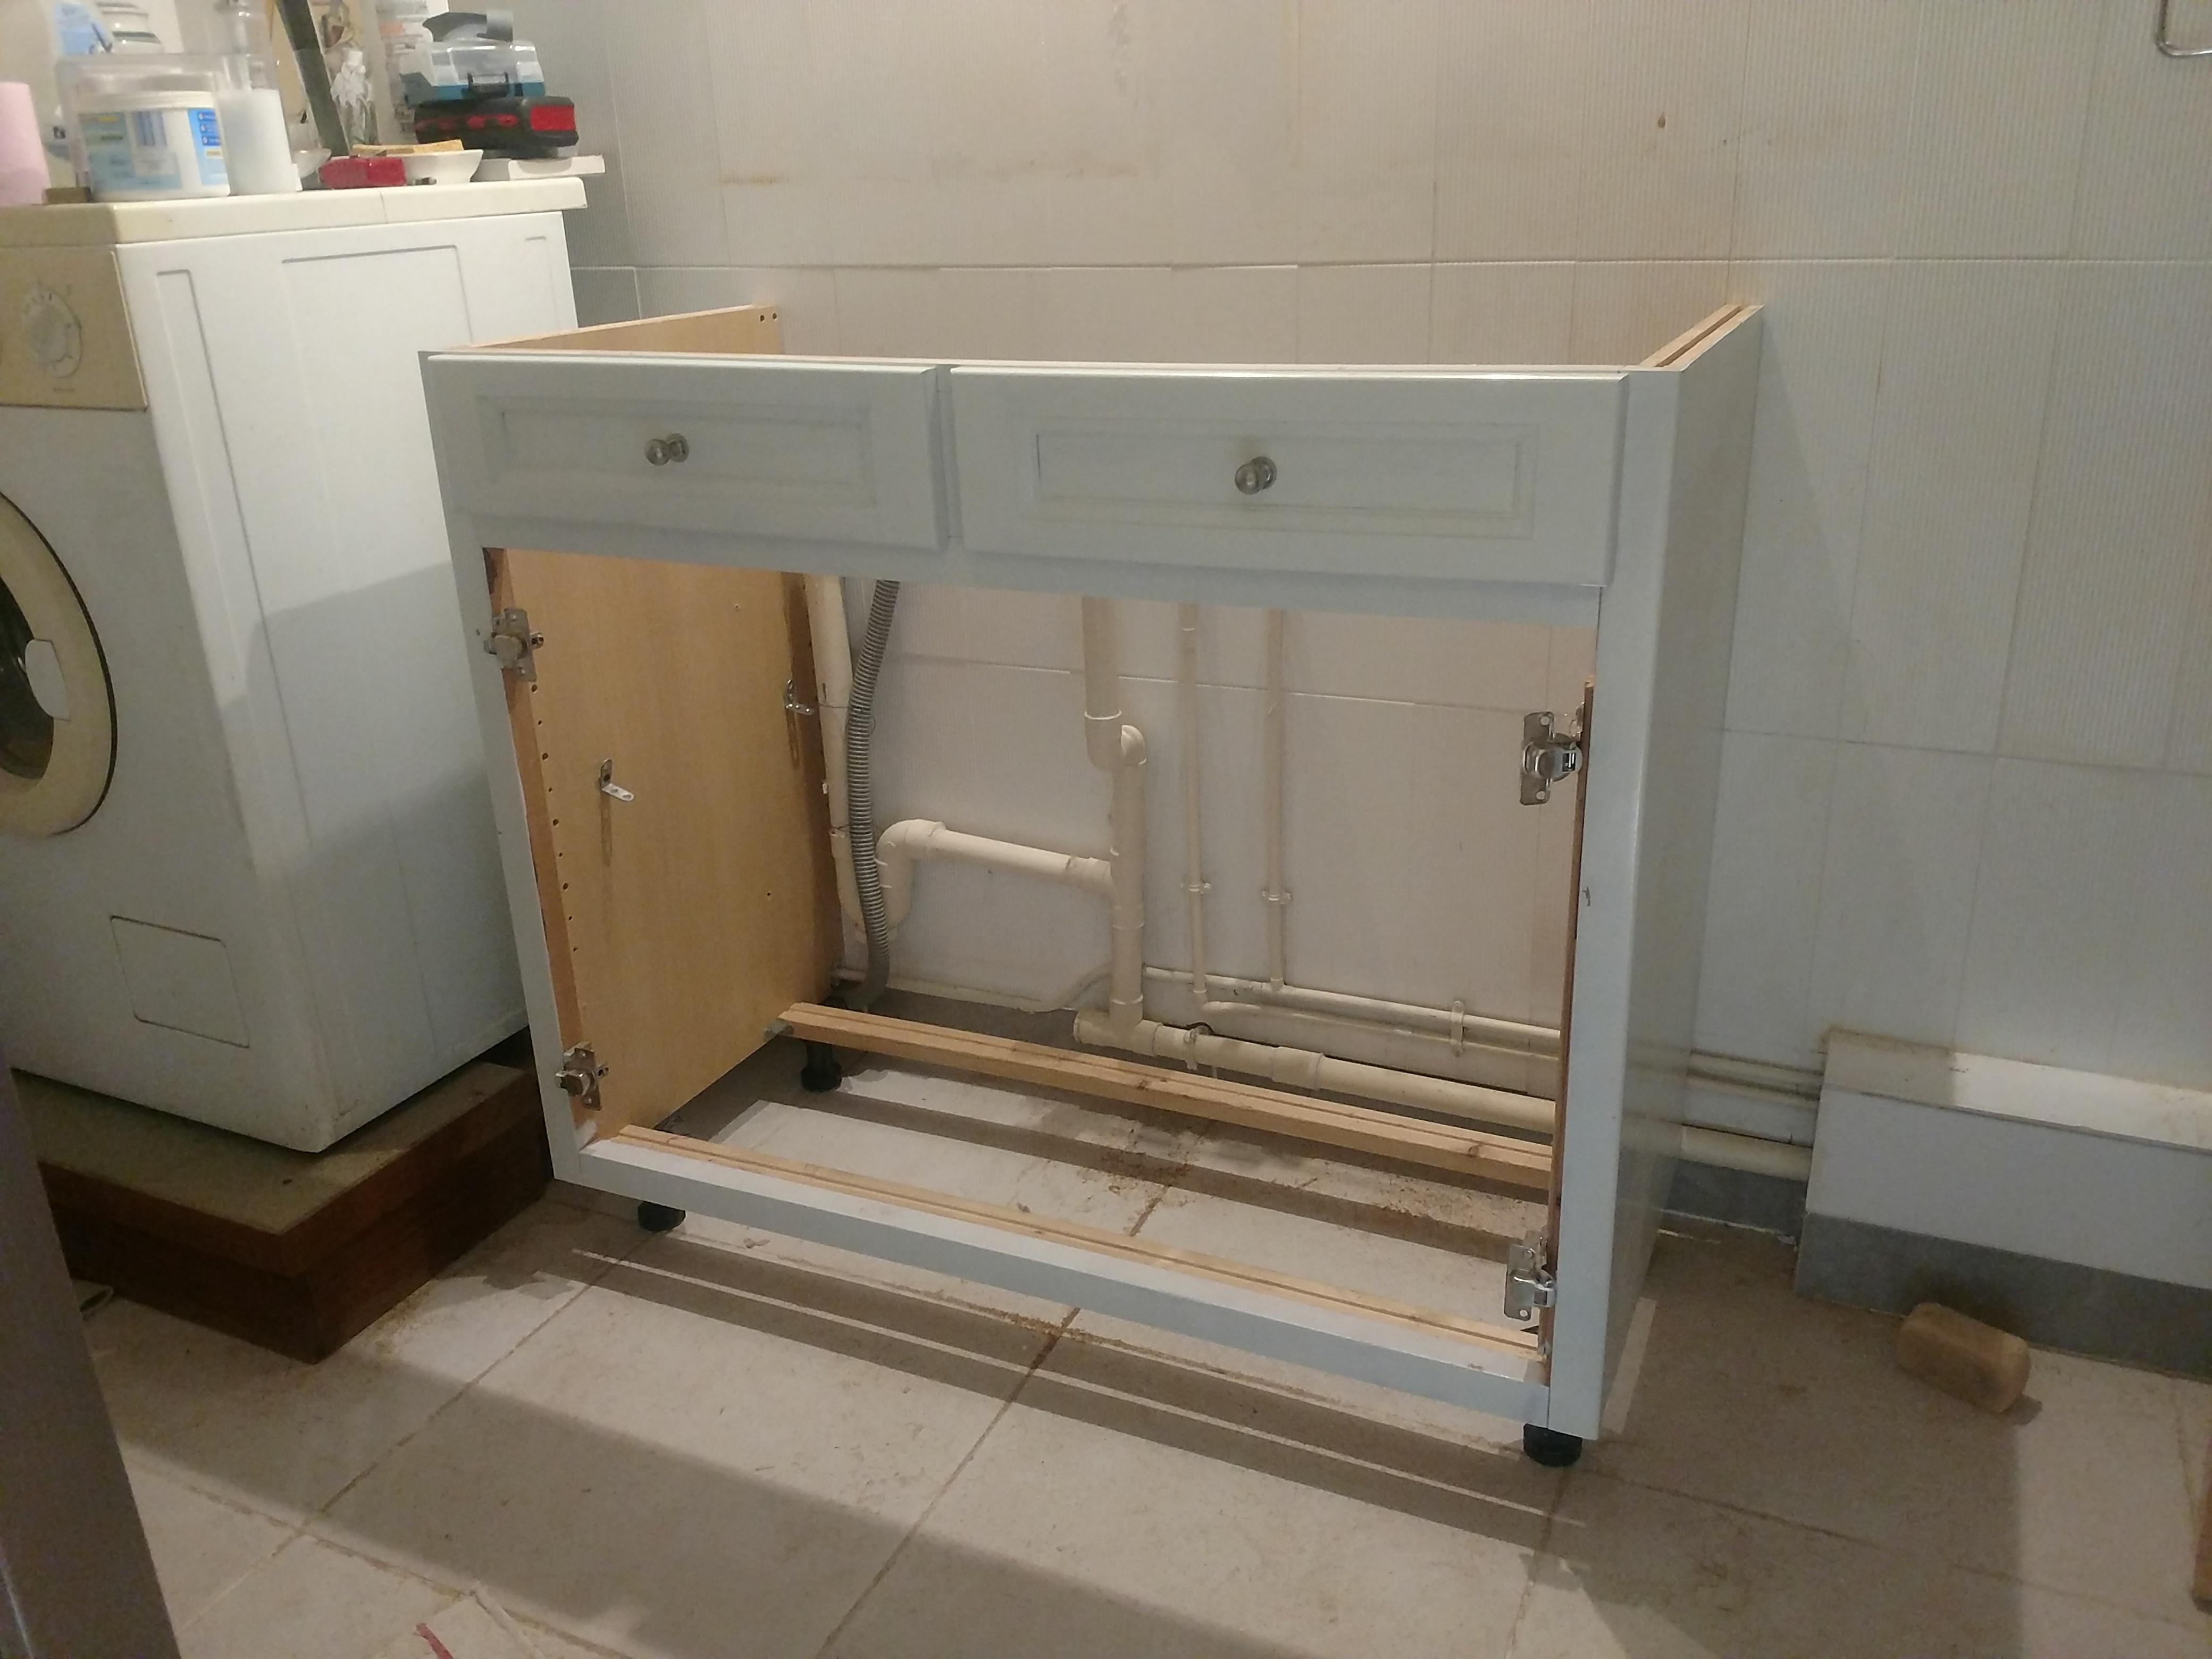 Un meuble de cuisine + un plan Ikea rattviken = un meuble de salle